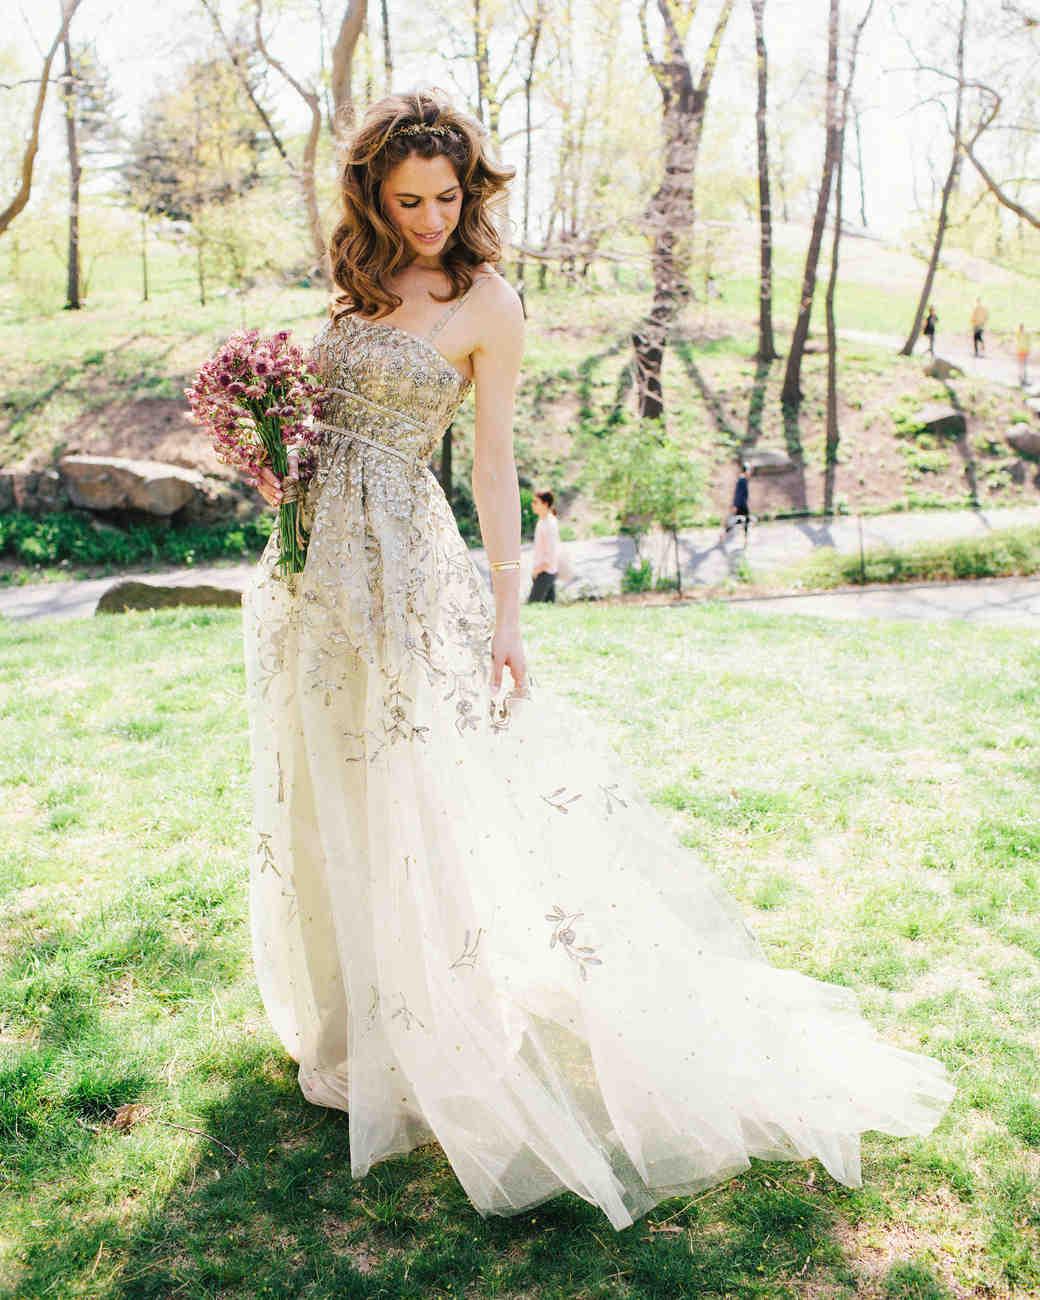 bride in sparkling dress